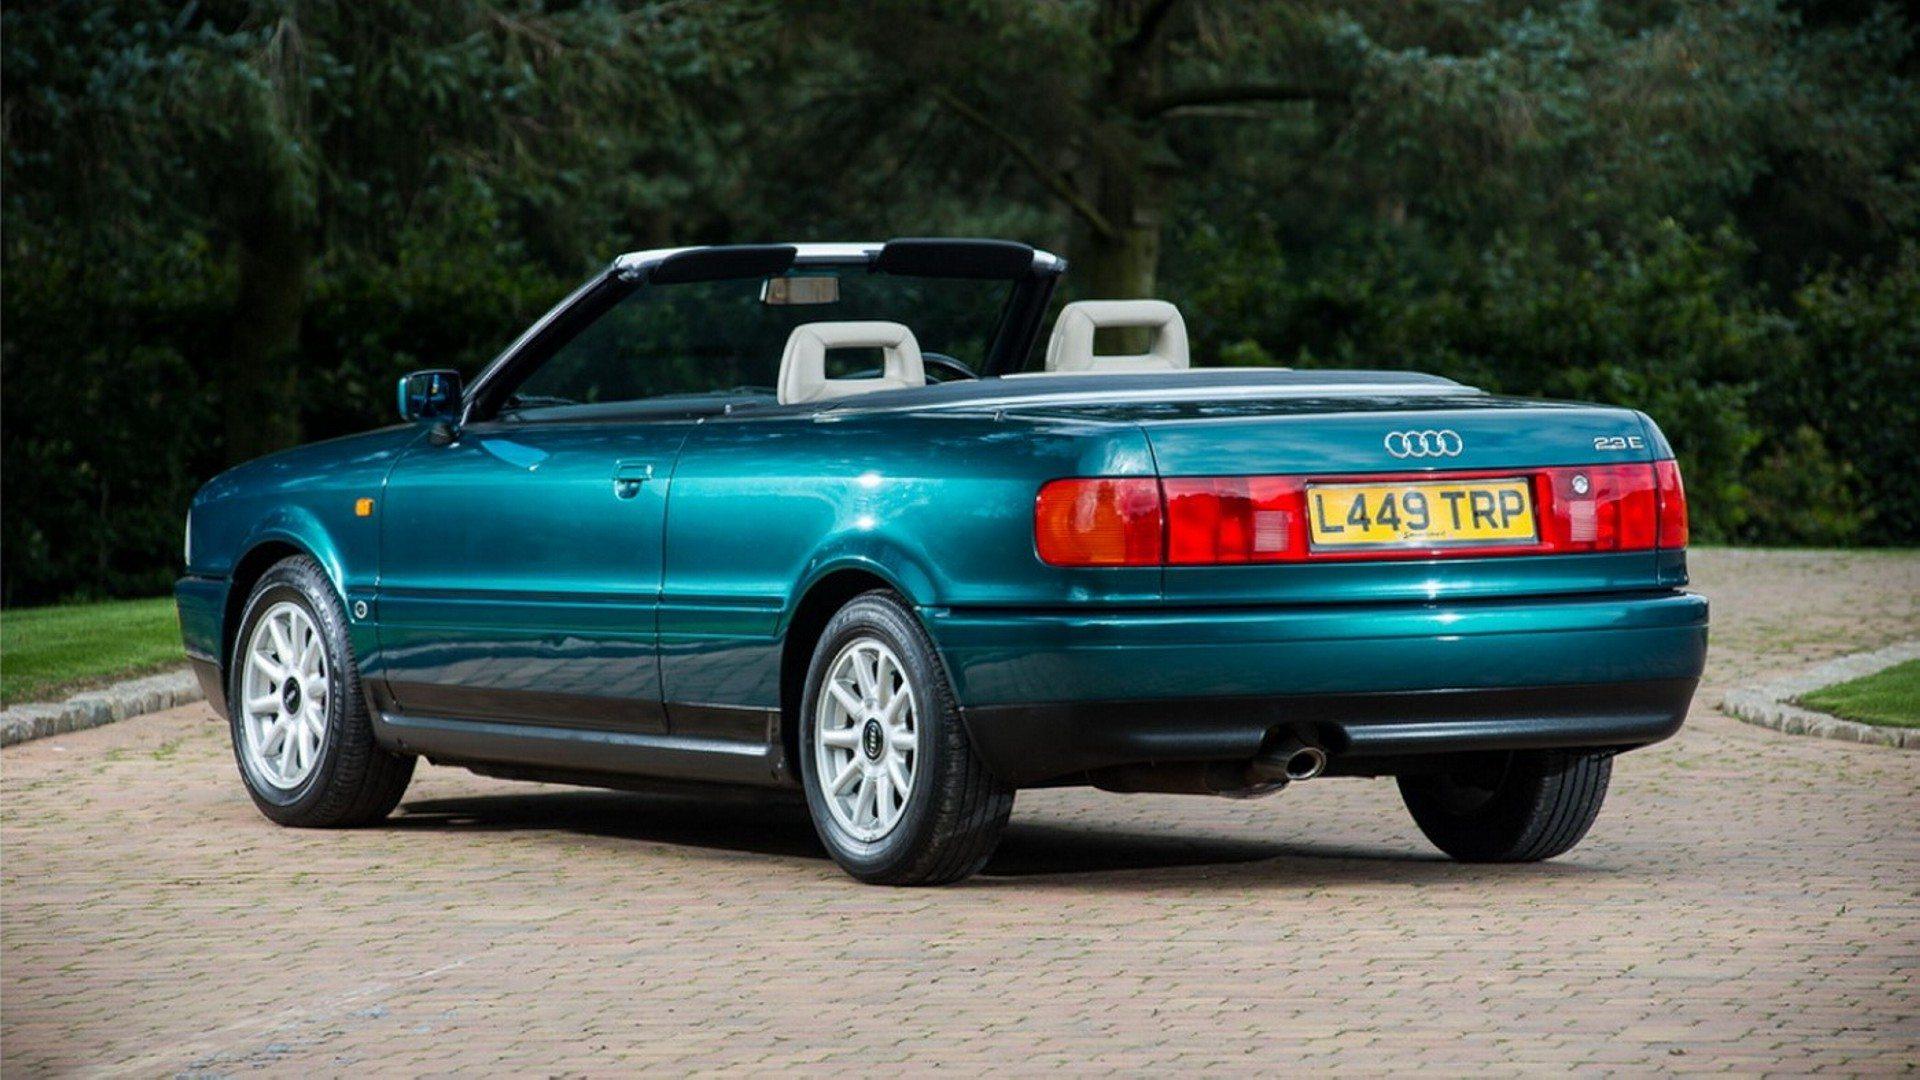 1994 Audi 80 Cabriolet Lady Di (2)